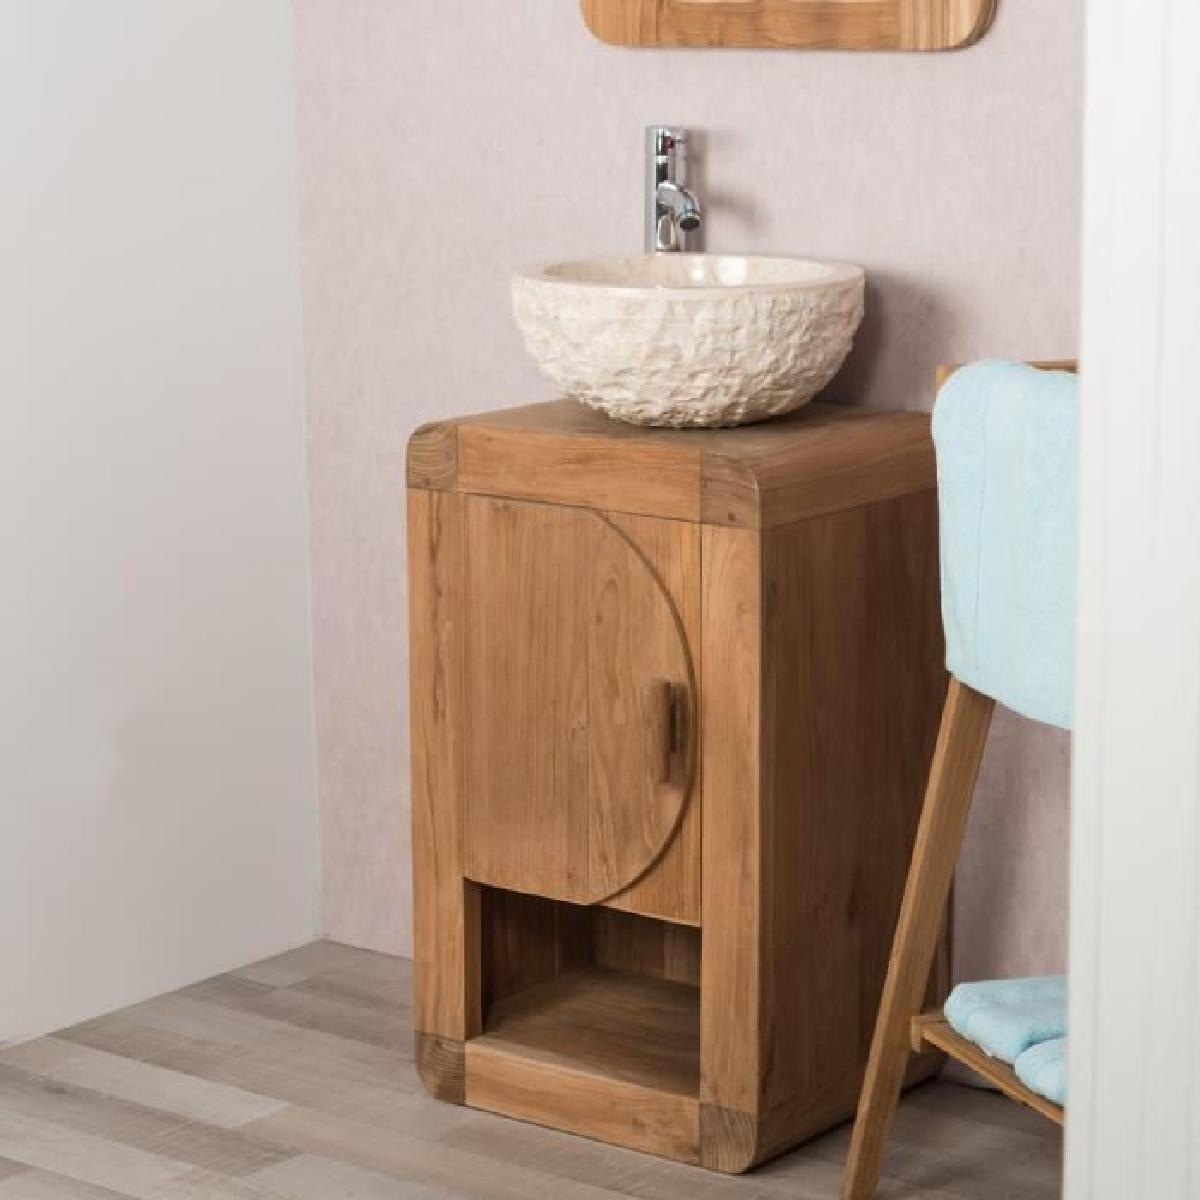 Meuble Wc Brico Dépot Nouveau Photos Article with Tag Ikea Lamp Shades